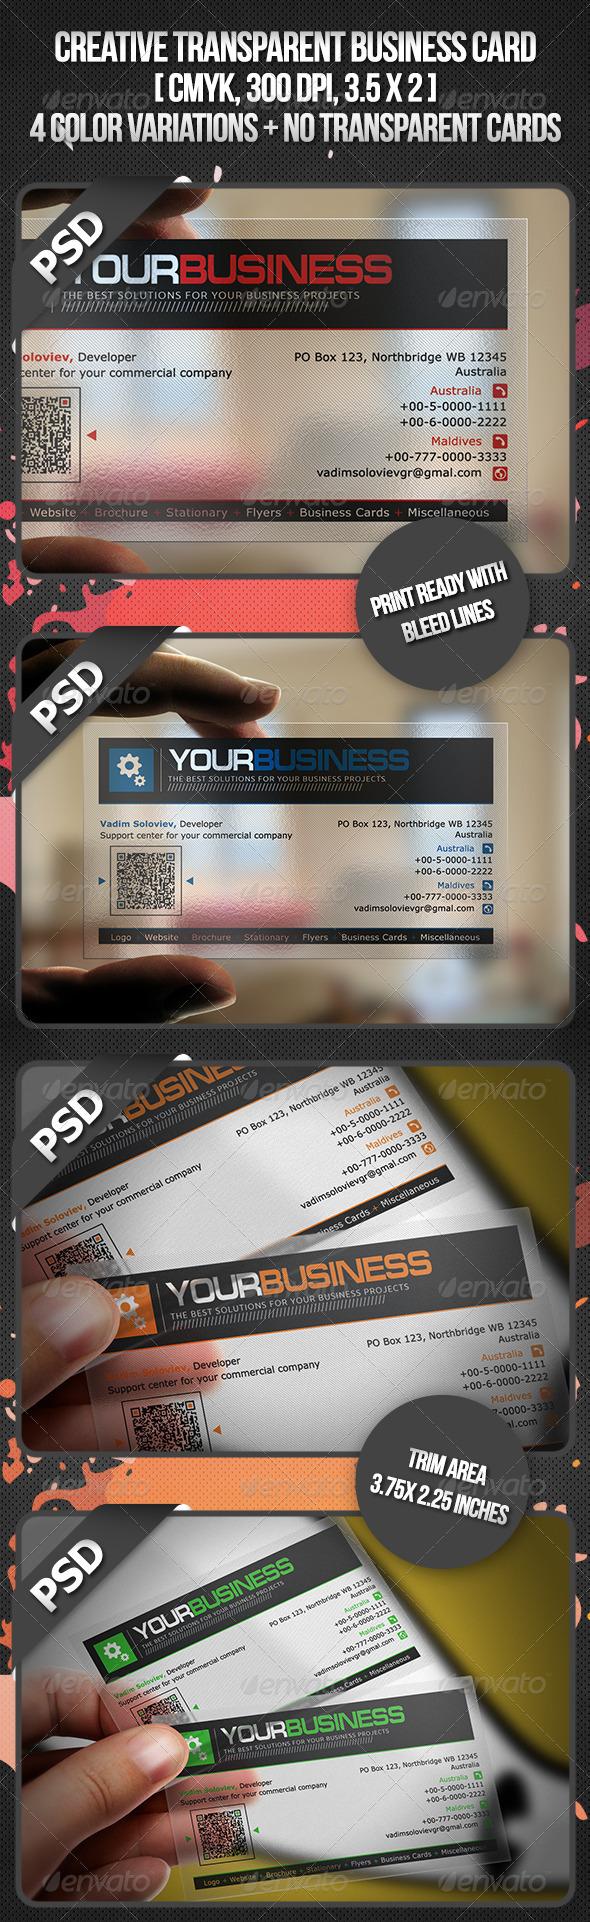 Creative Transparent Business Card - Creative Business Cards